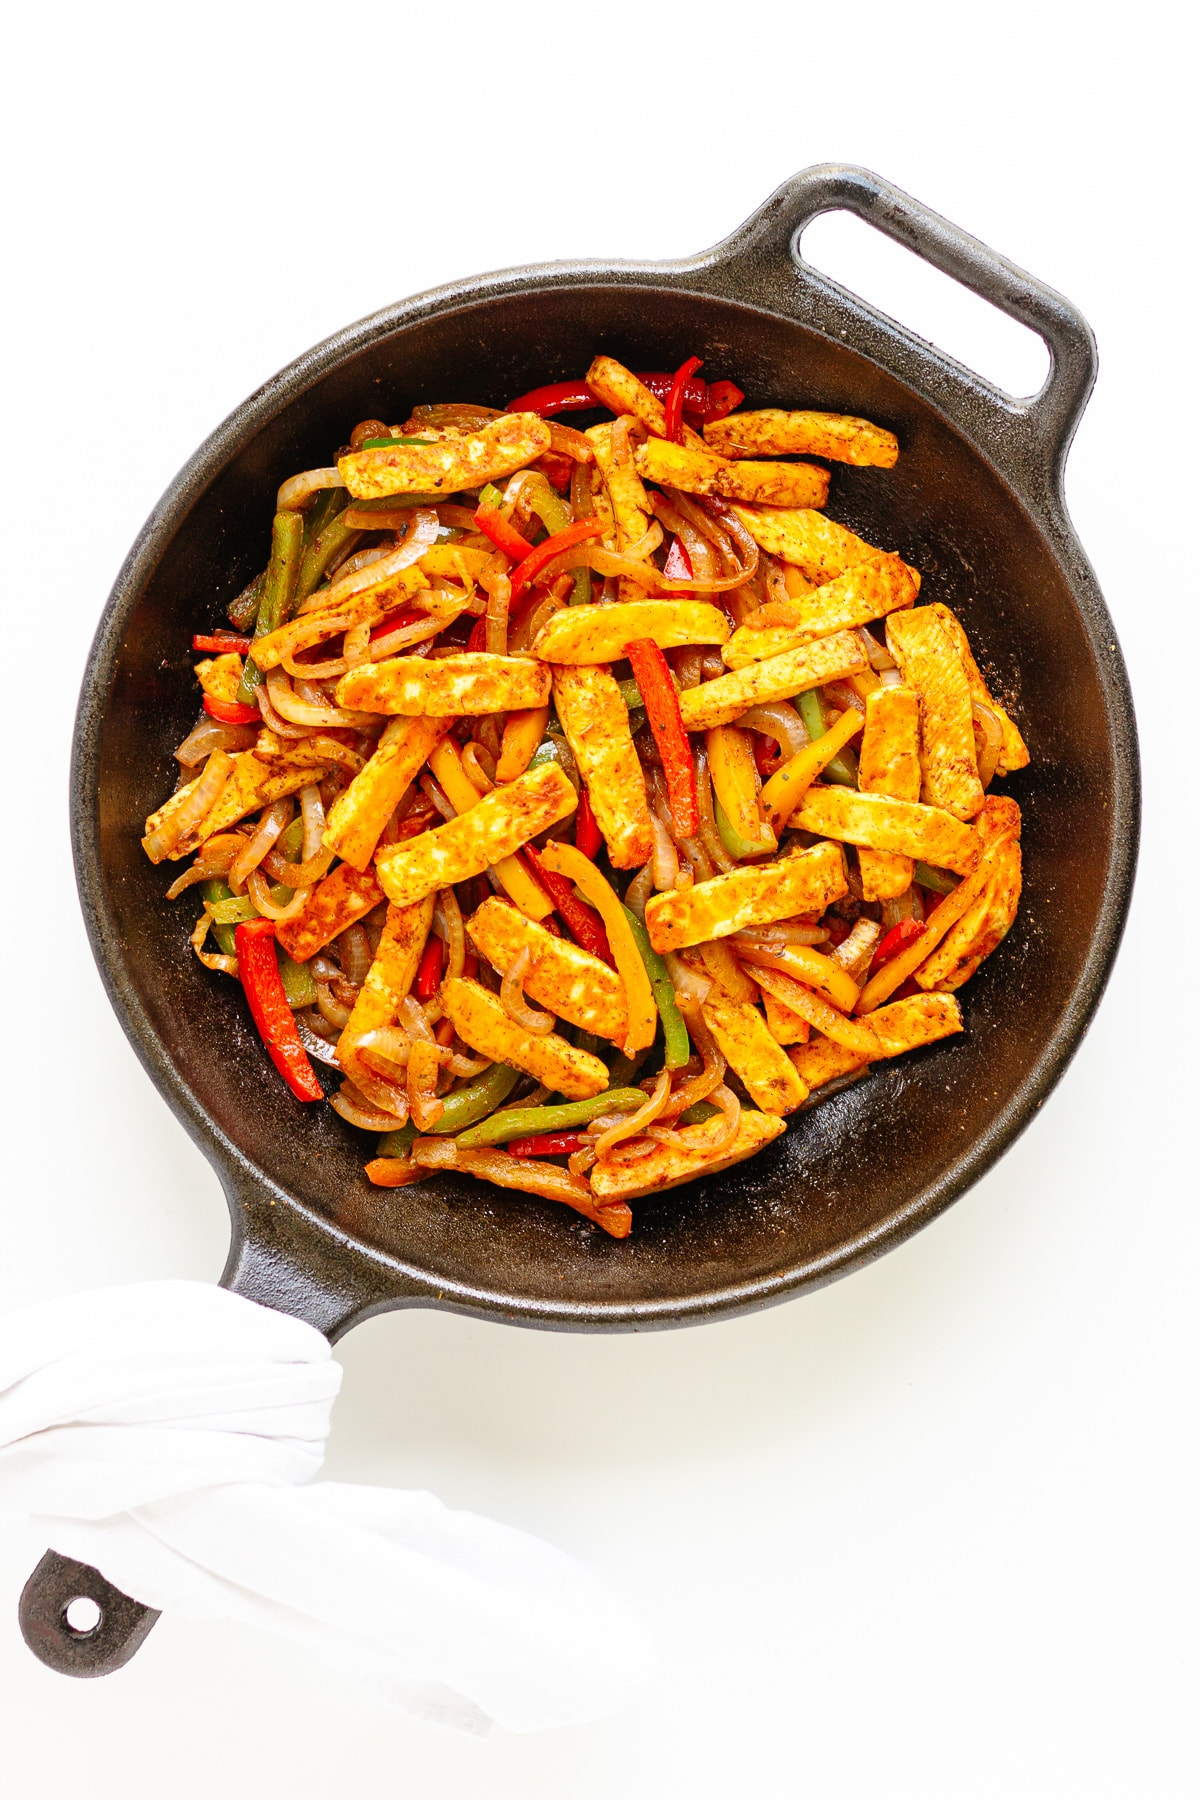 Fajita veggies with pan fried halloumi strips in a cast iron skillet.